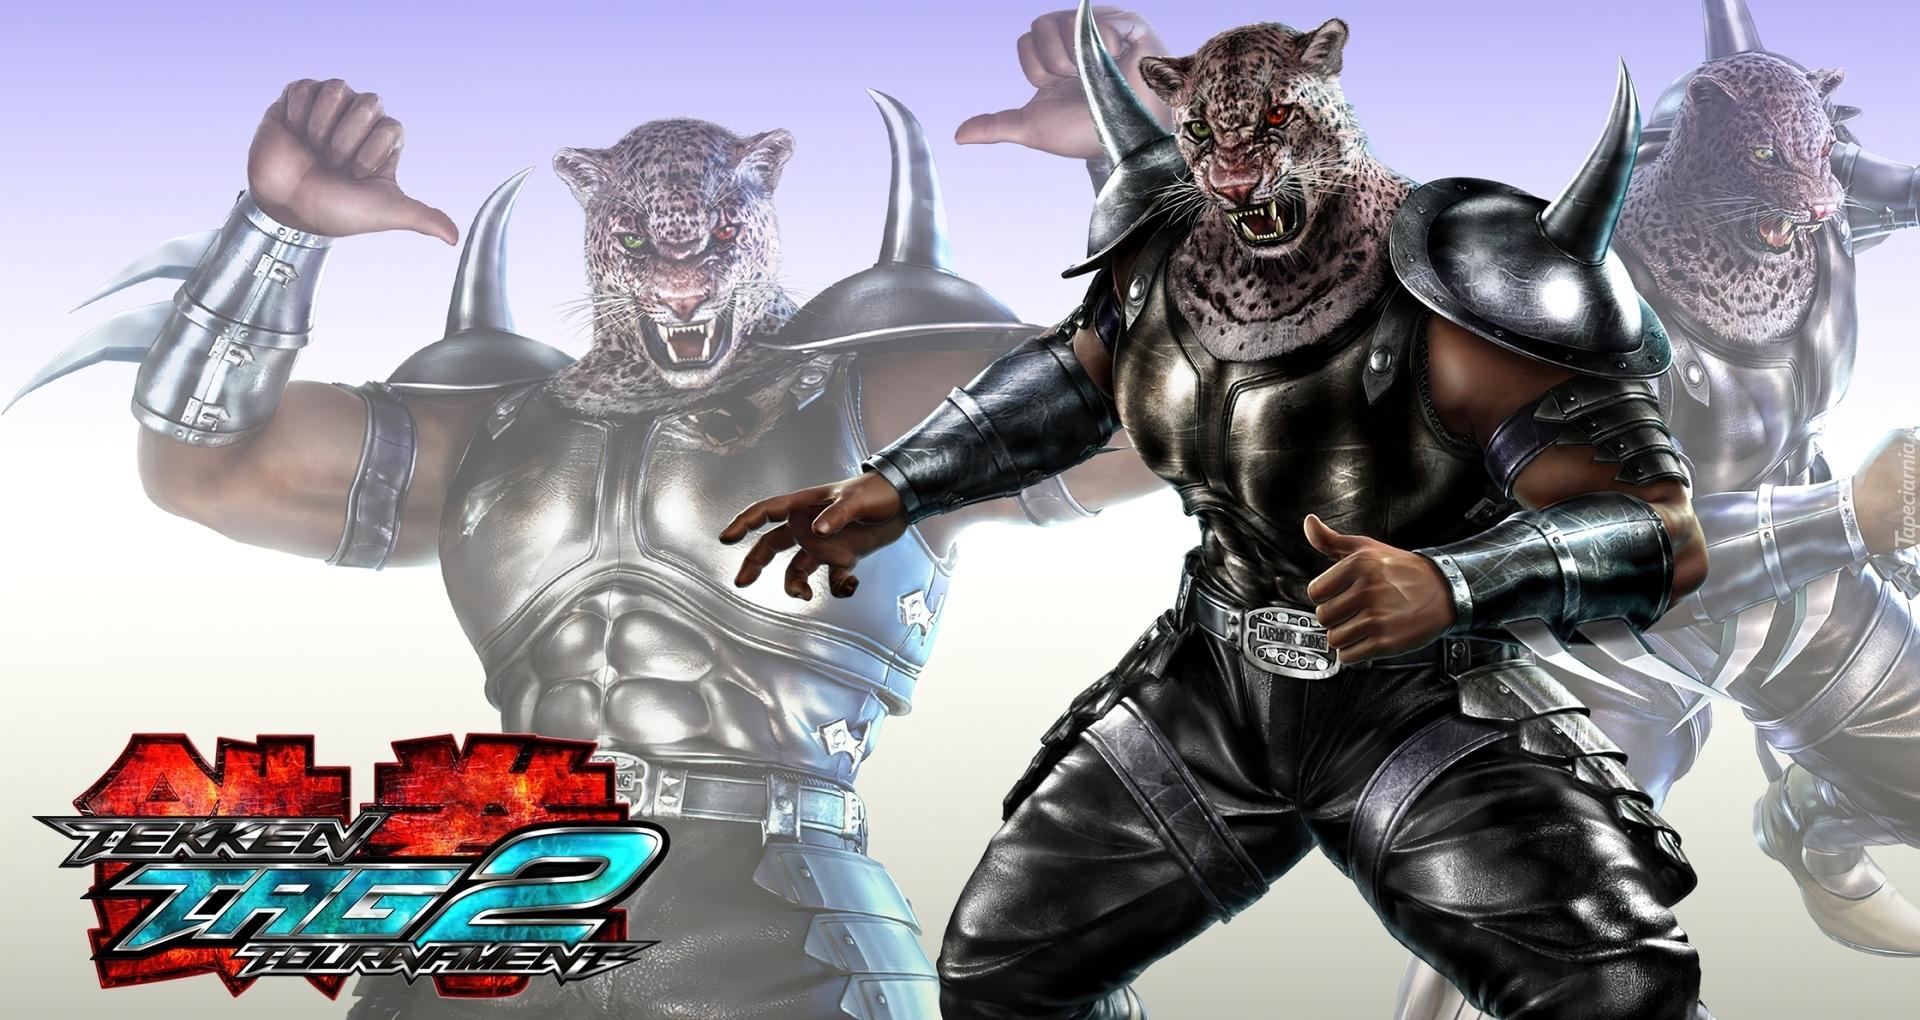 Tekken Tag Tournament 2 Armor King